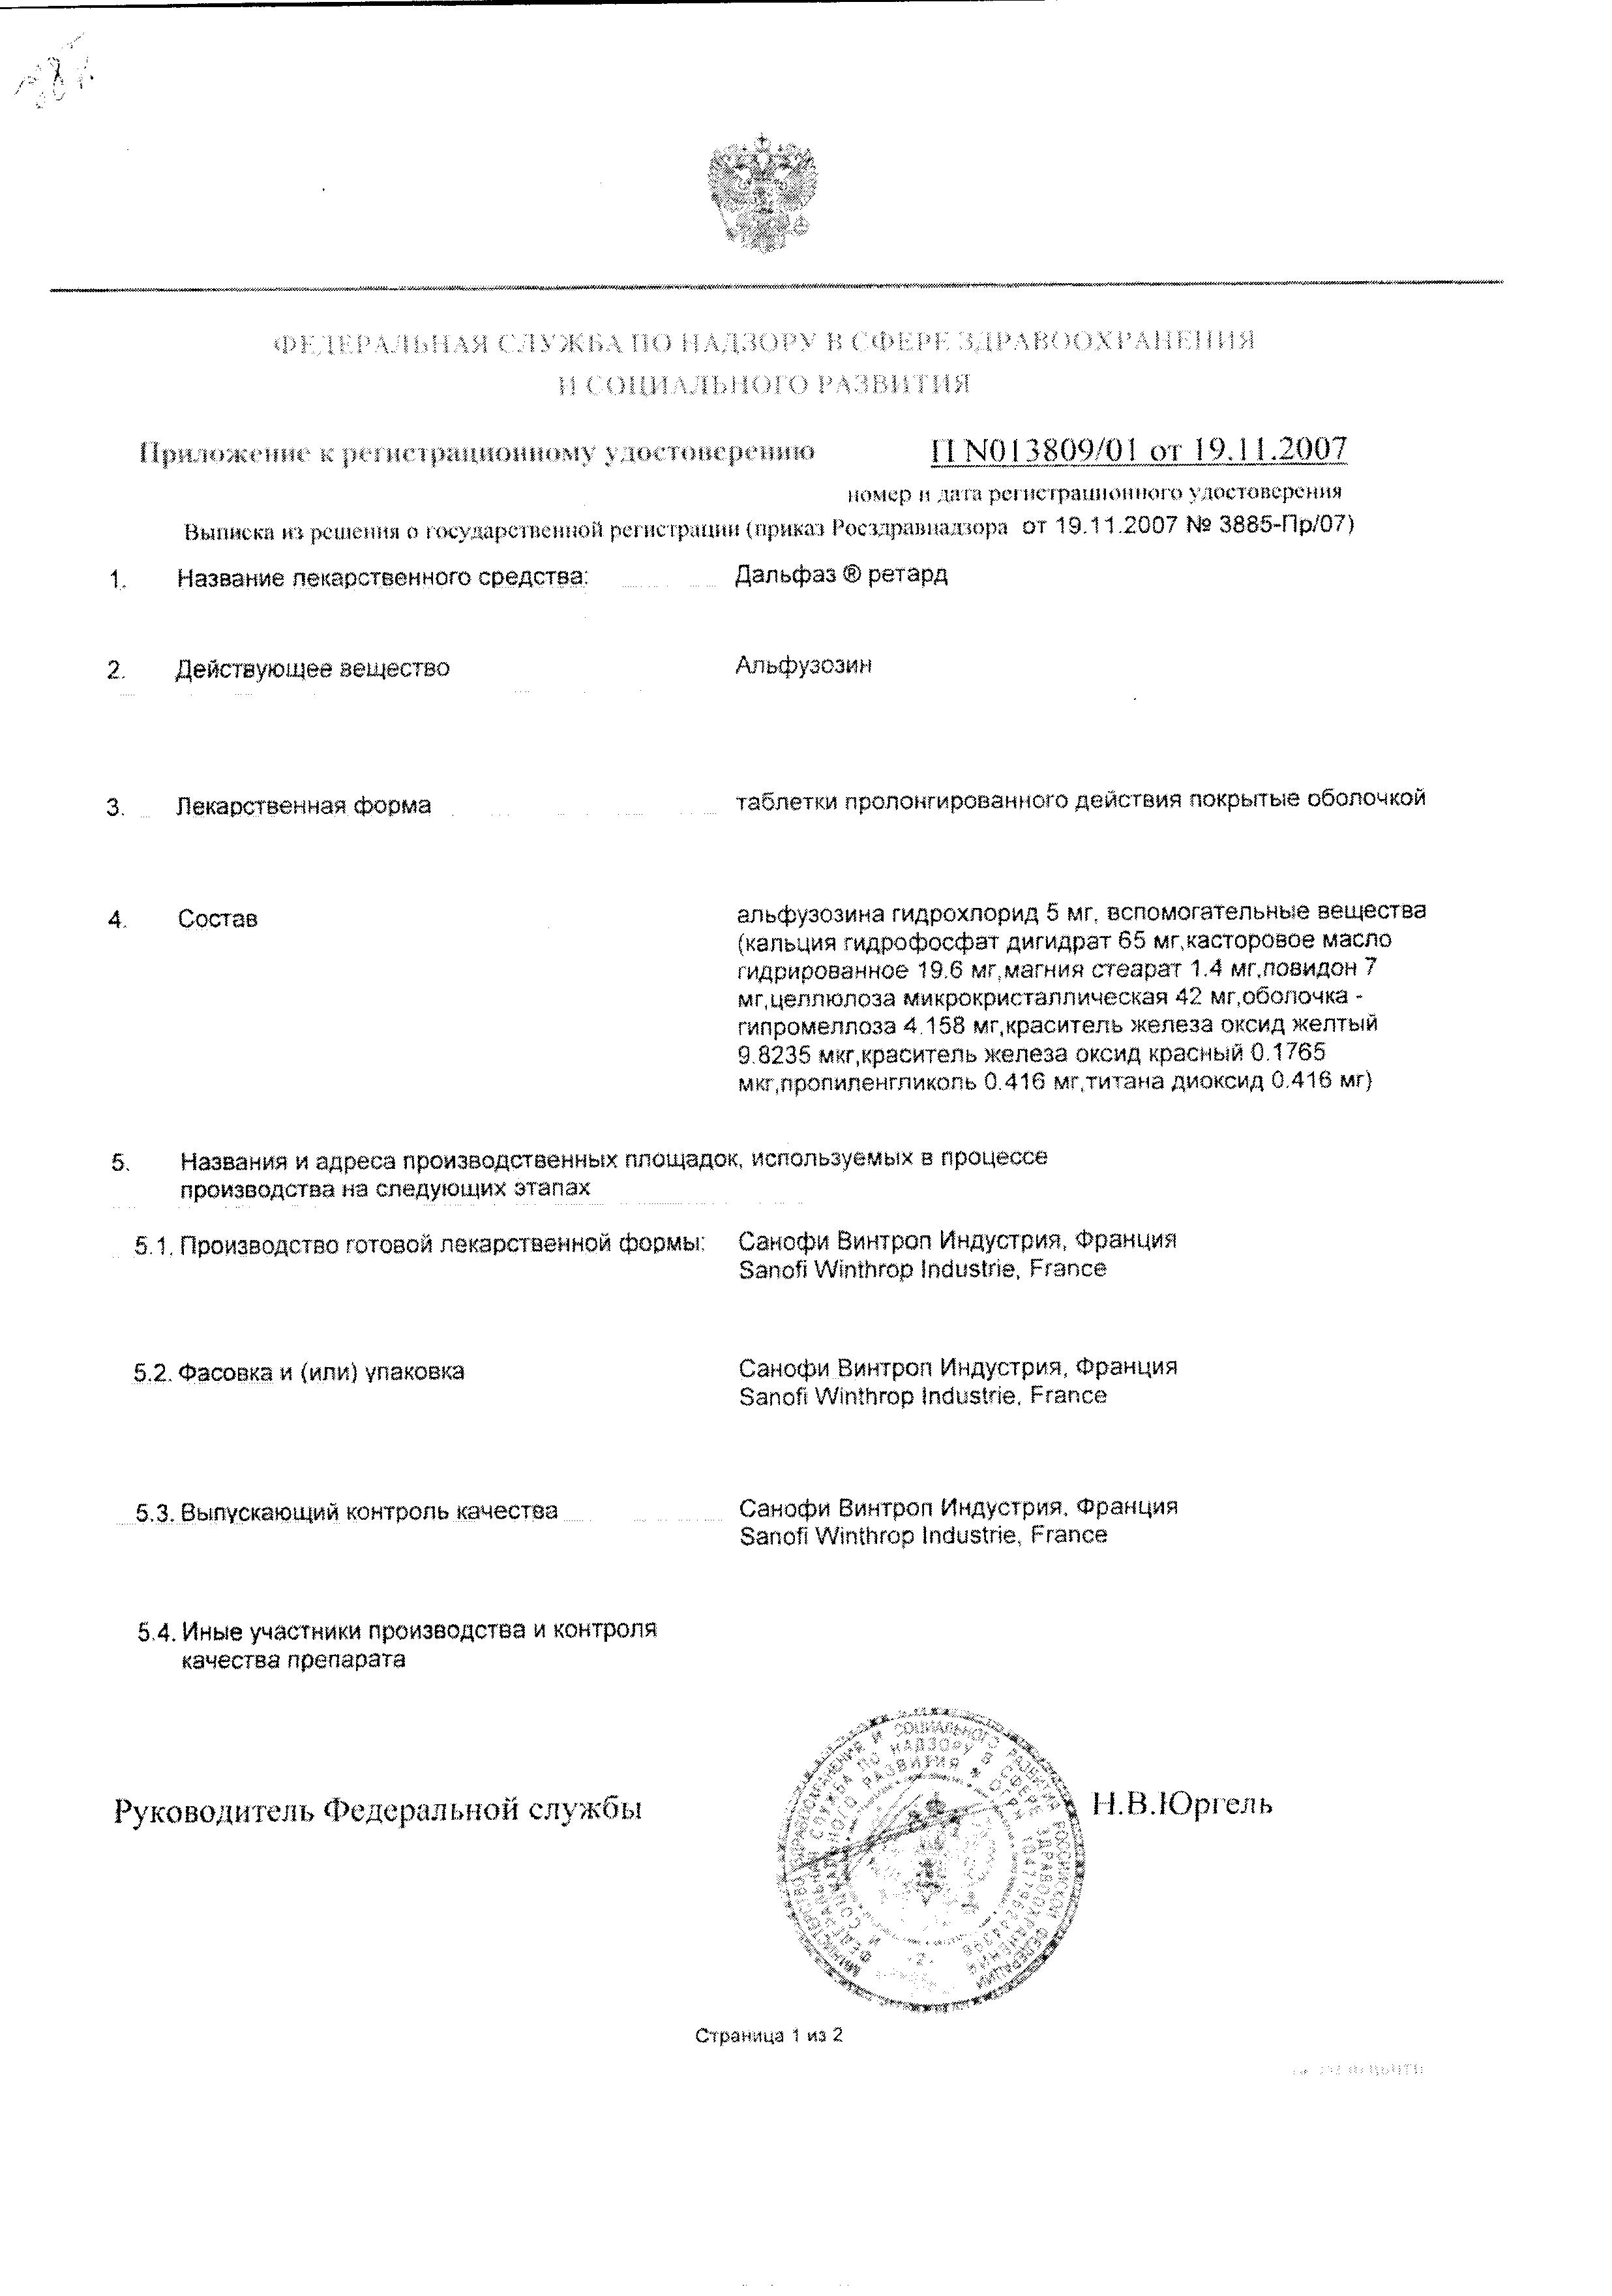 Дальфаз ретард сертификат